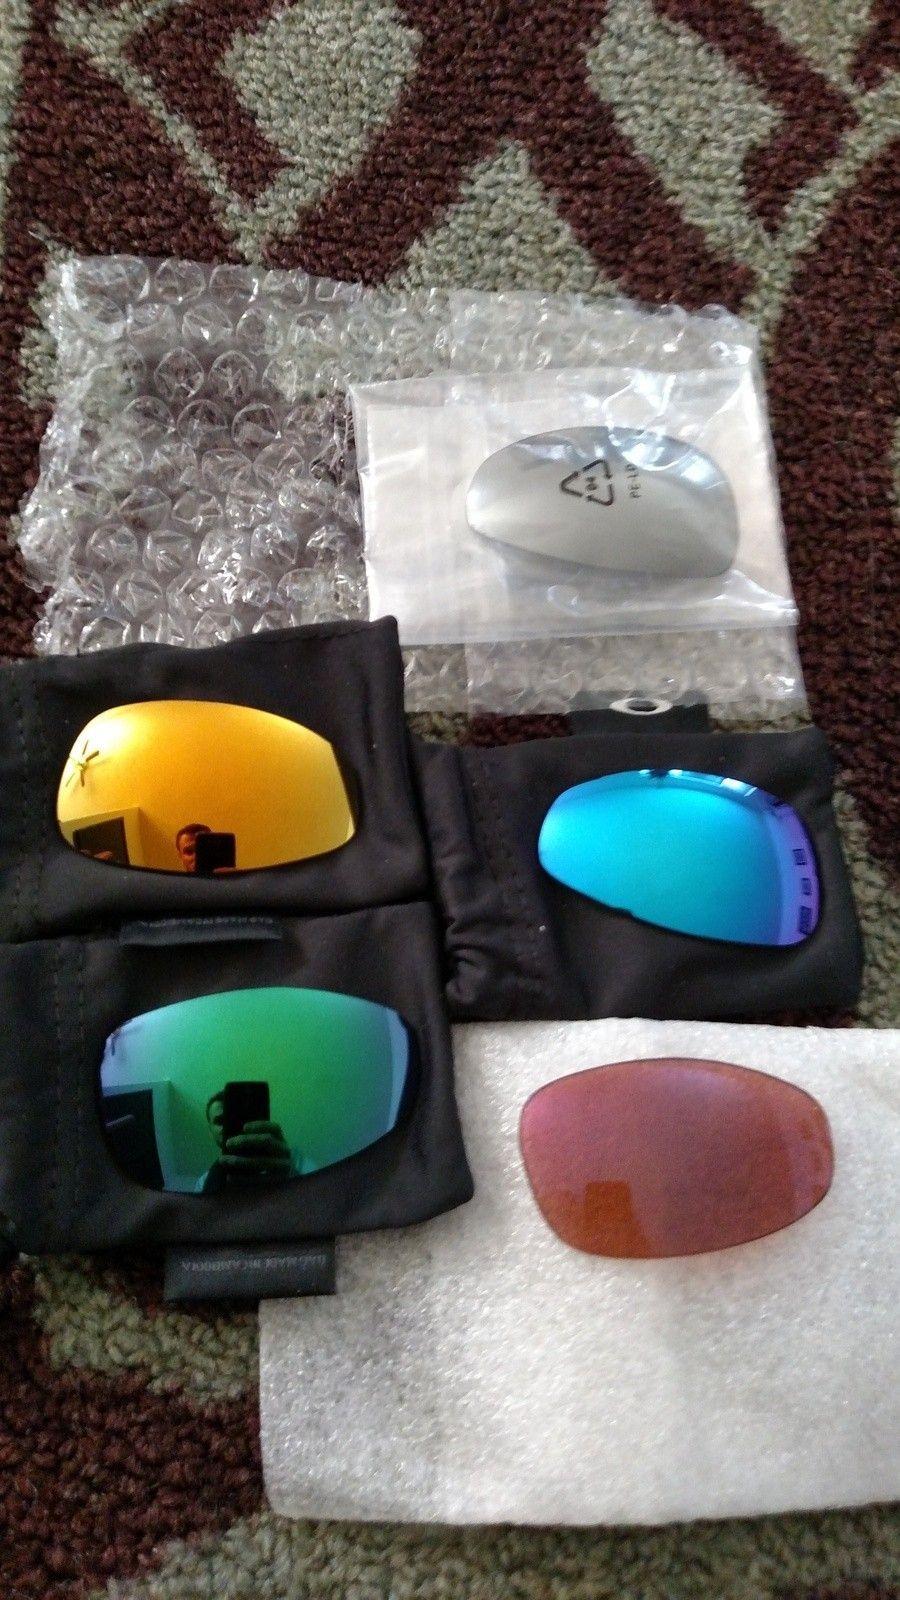 XX X METAL (Ruby & Violet Iridium) custom cut lenses. - 1450650458709512888576.jpg